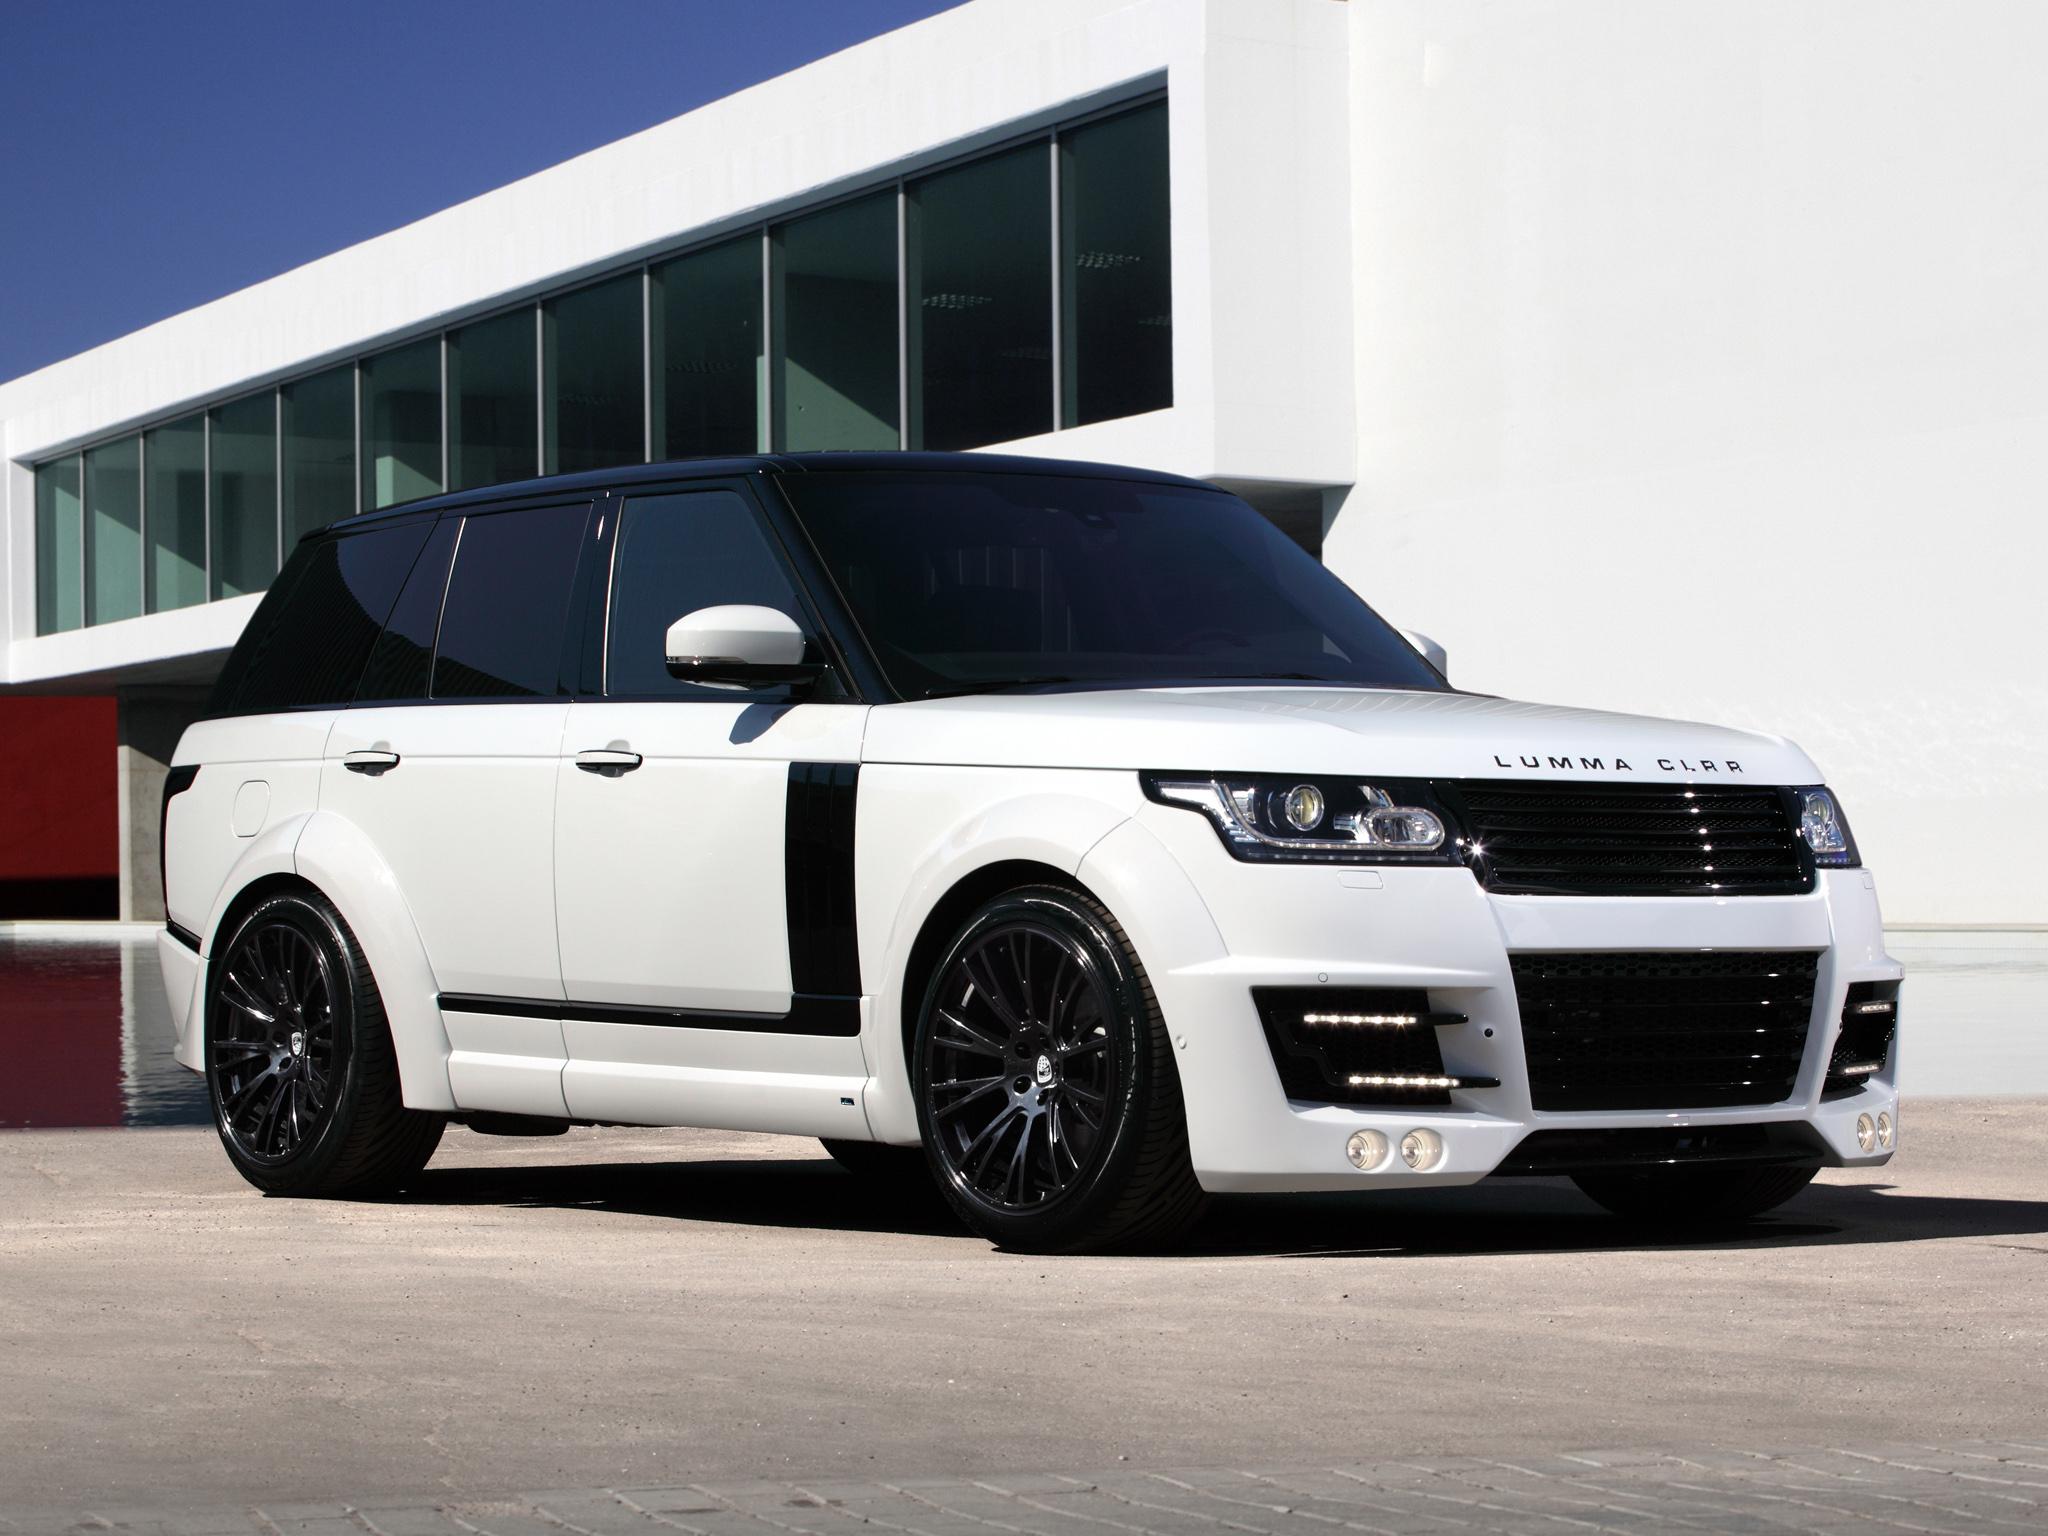 2013 Lumma Clr R Range Rover Supercharged Tuning Suv Fs